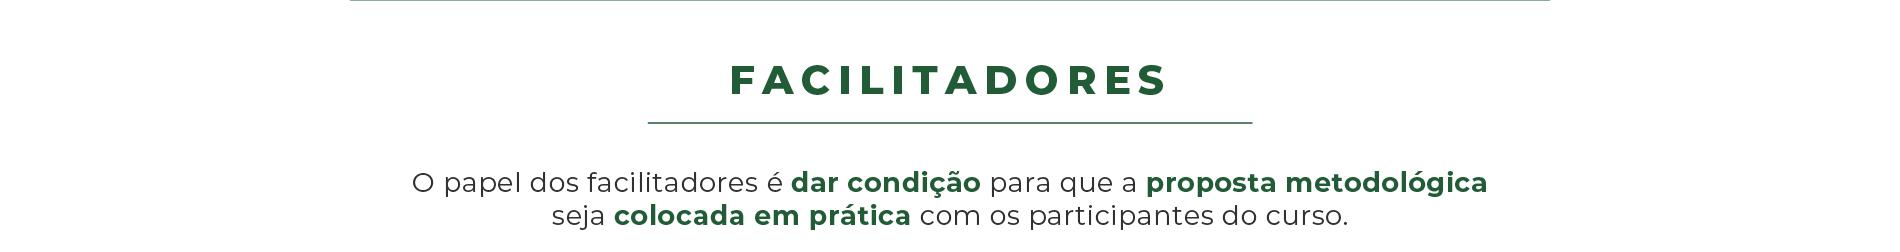 https://www.mestregp.com.br/wp-content/uploads/2018/01/MGP_Treinamento-slice-04-1900x252.png